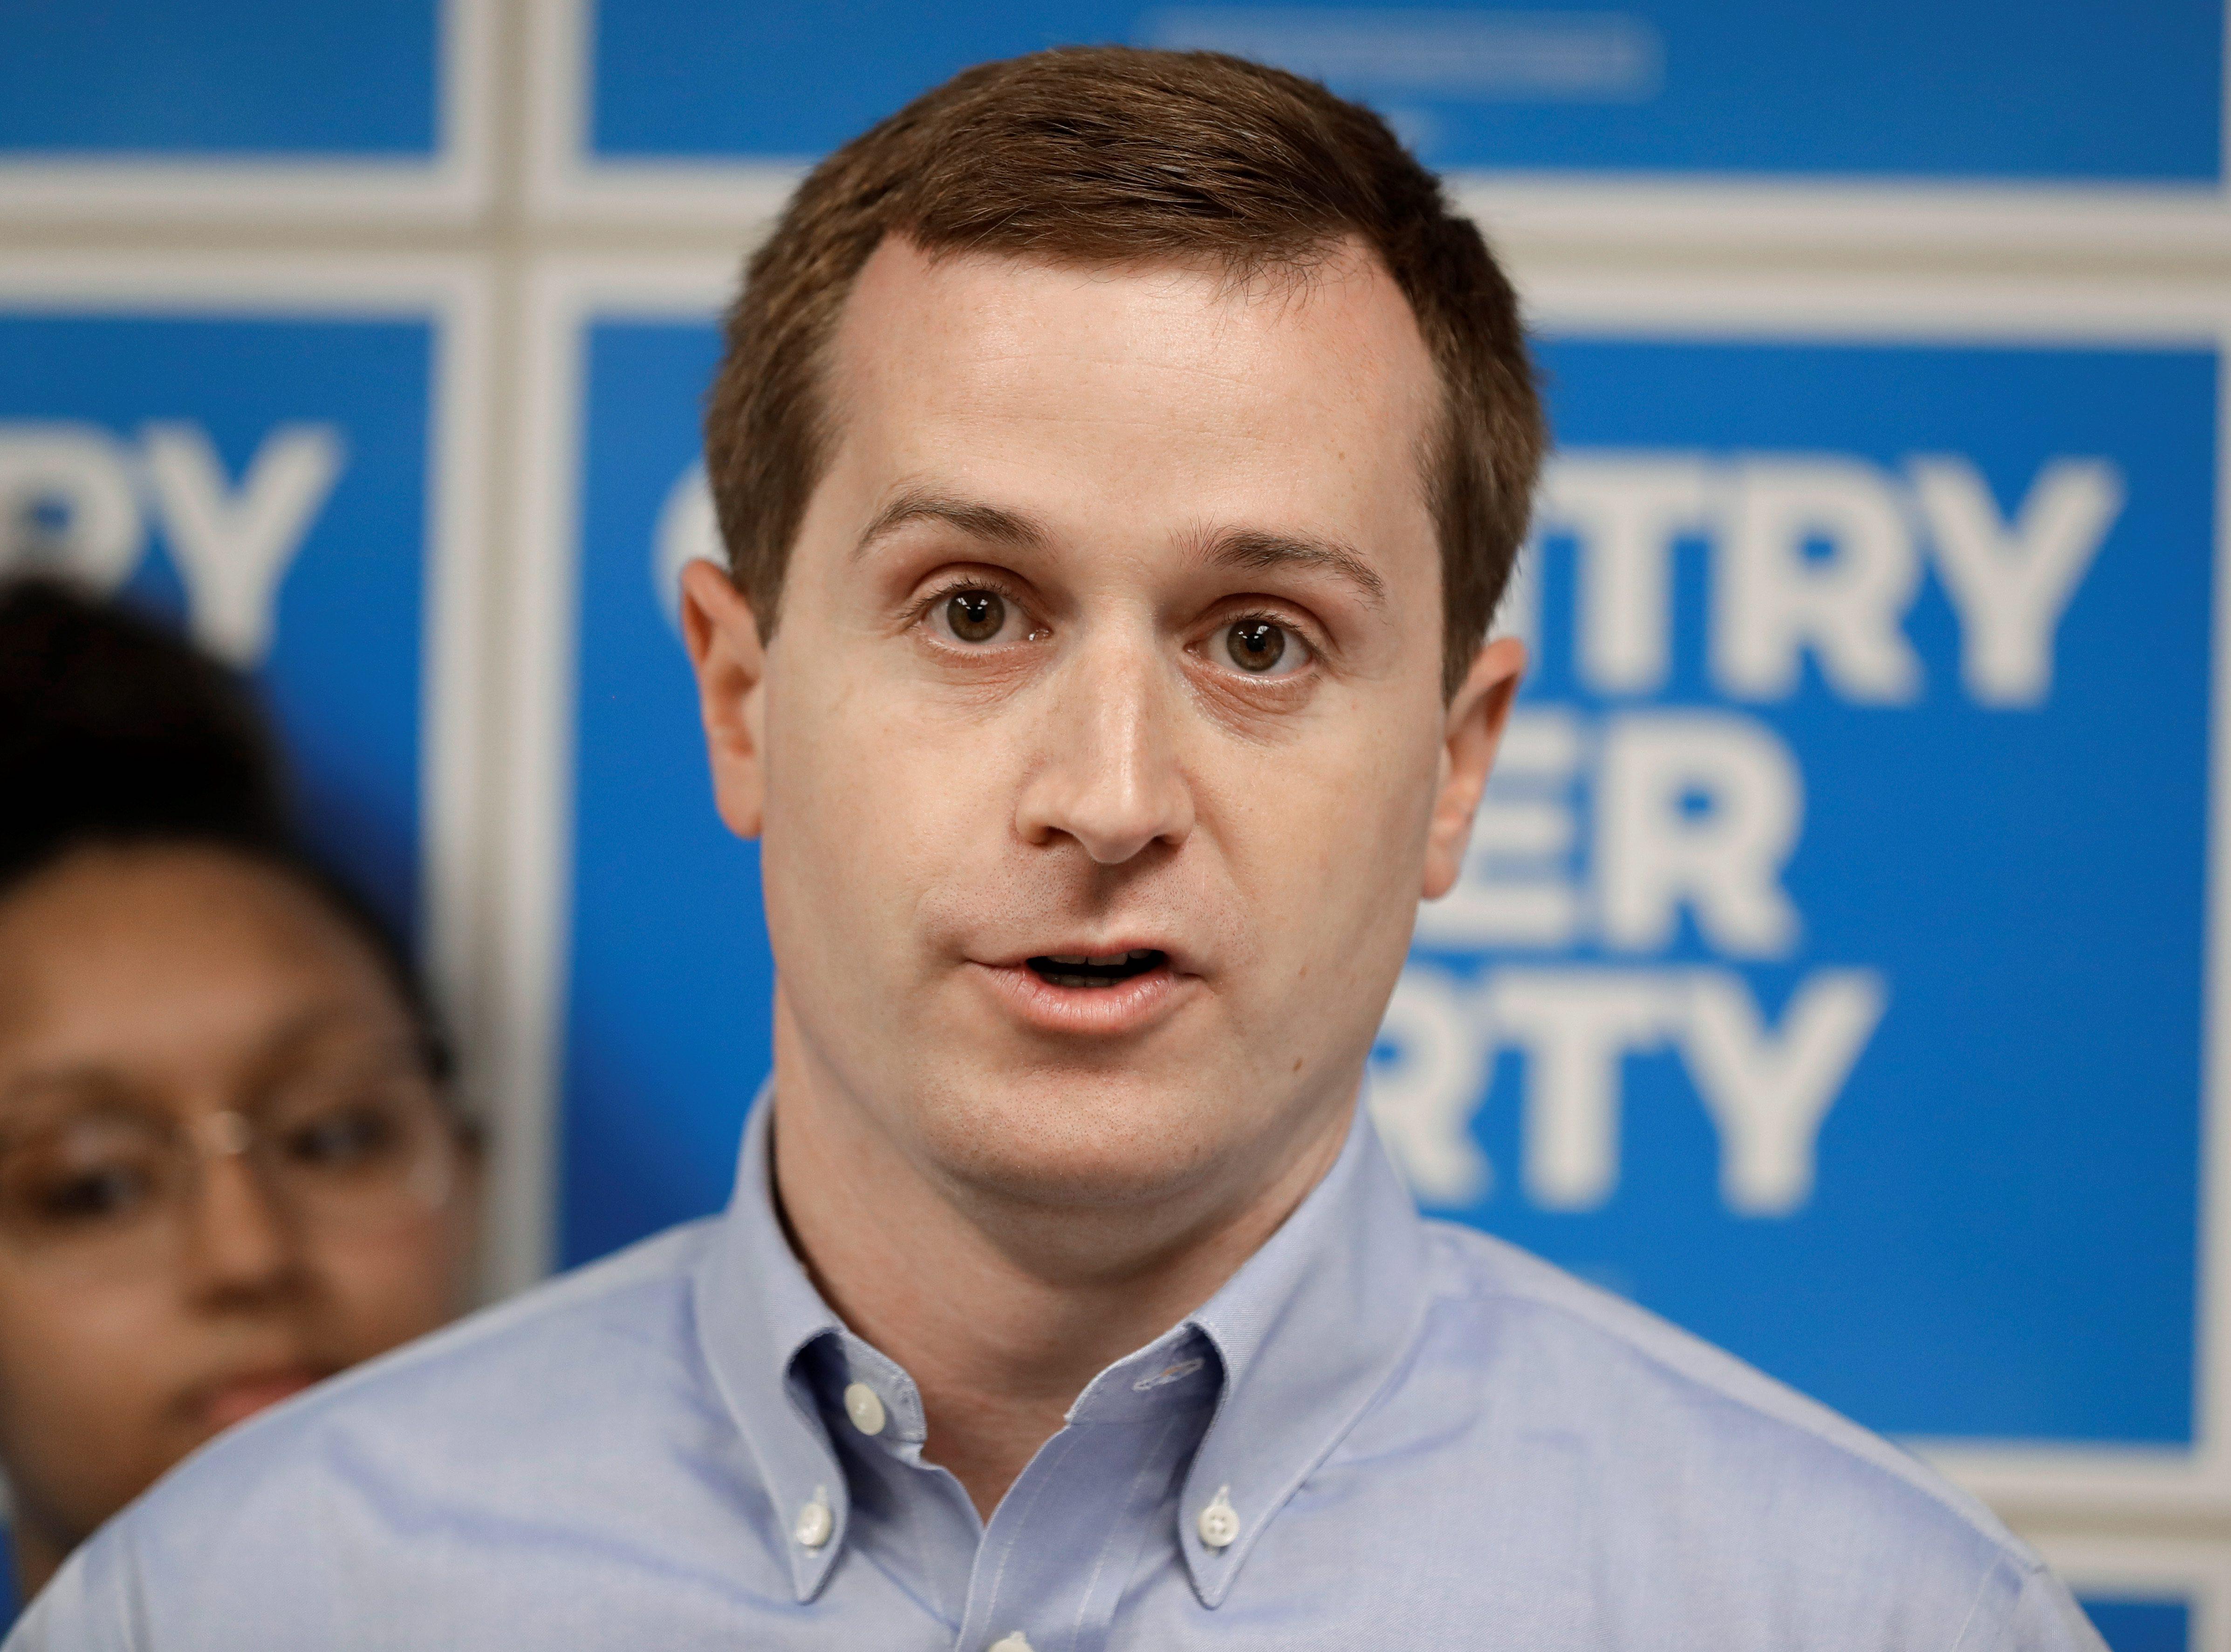 GOP leaders fear Dan Bishop loss to Dan McCready in North Carolina special election